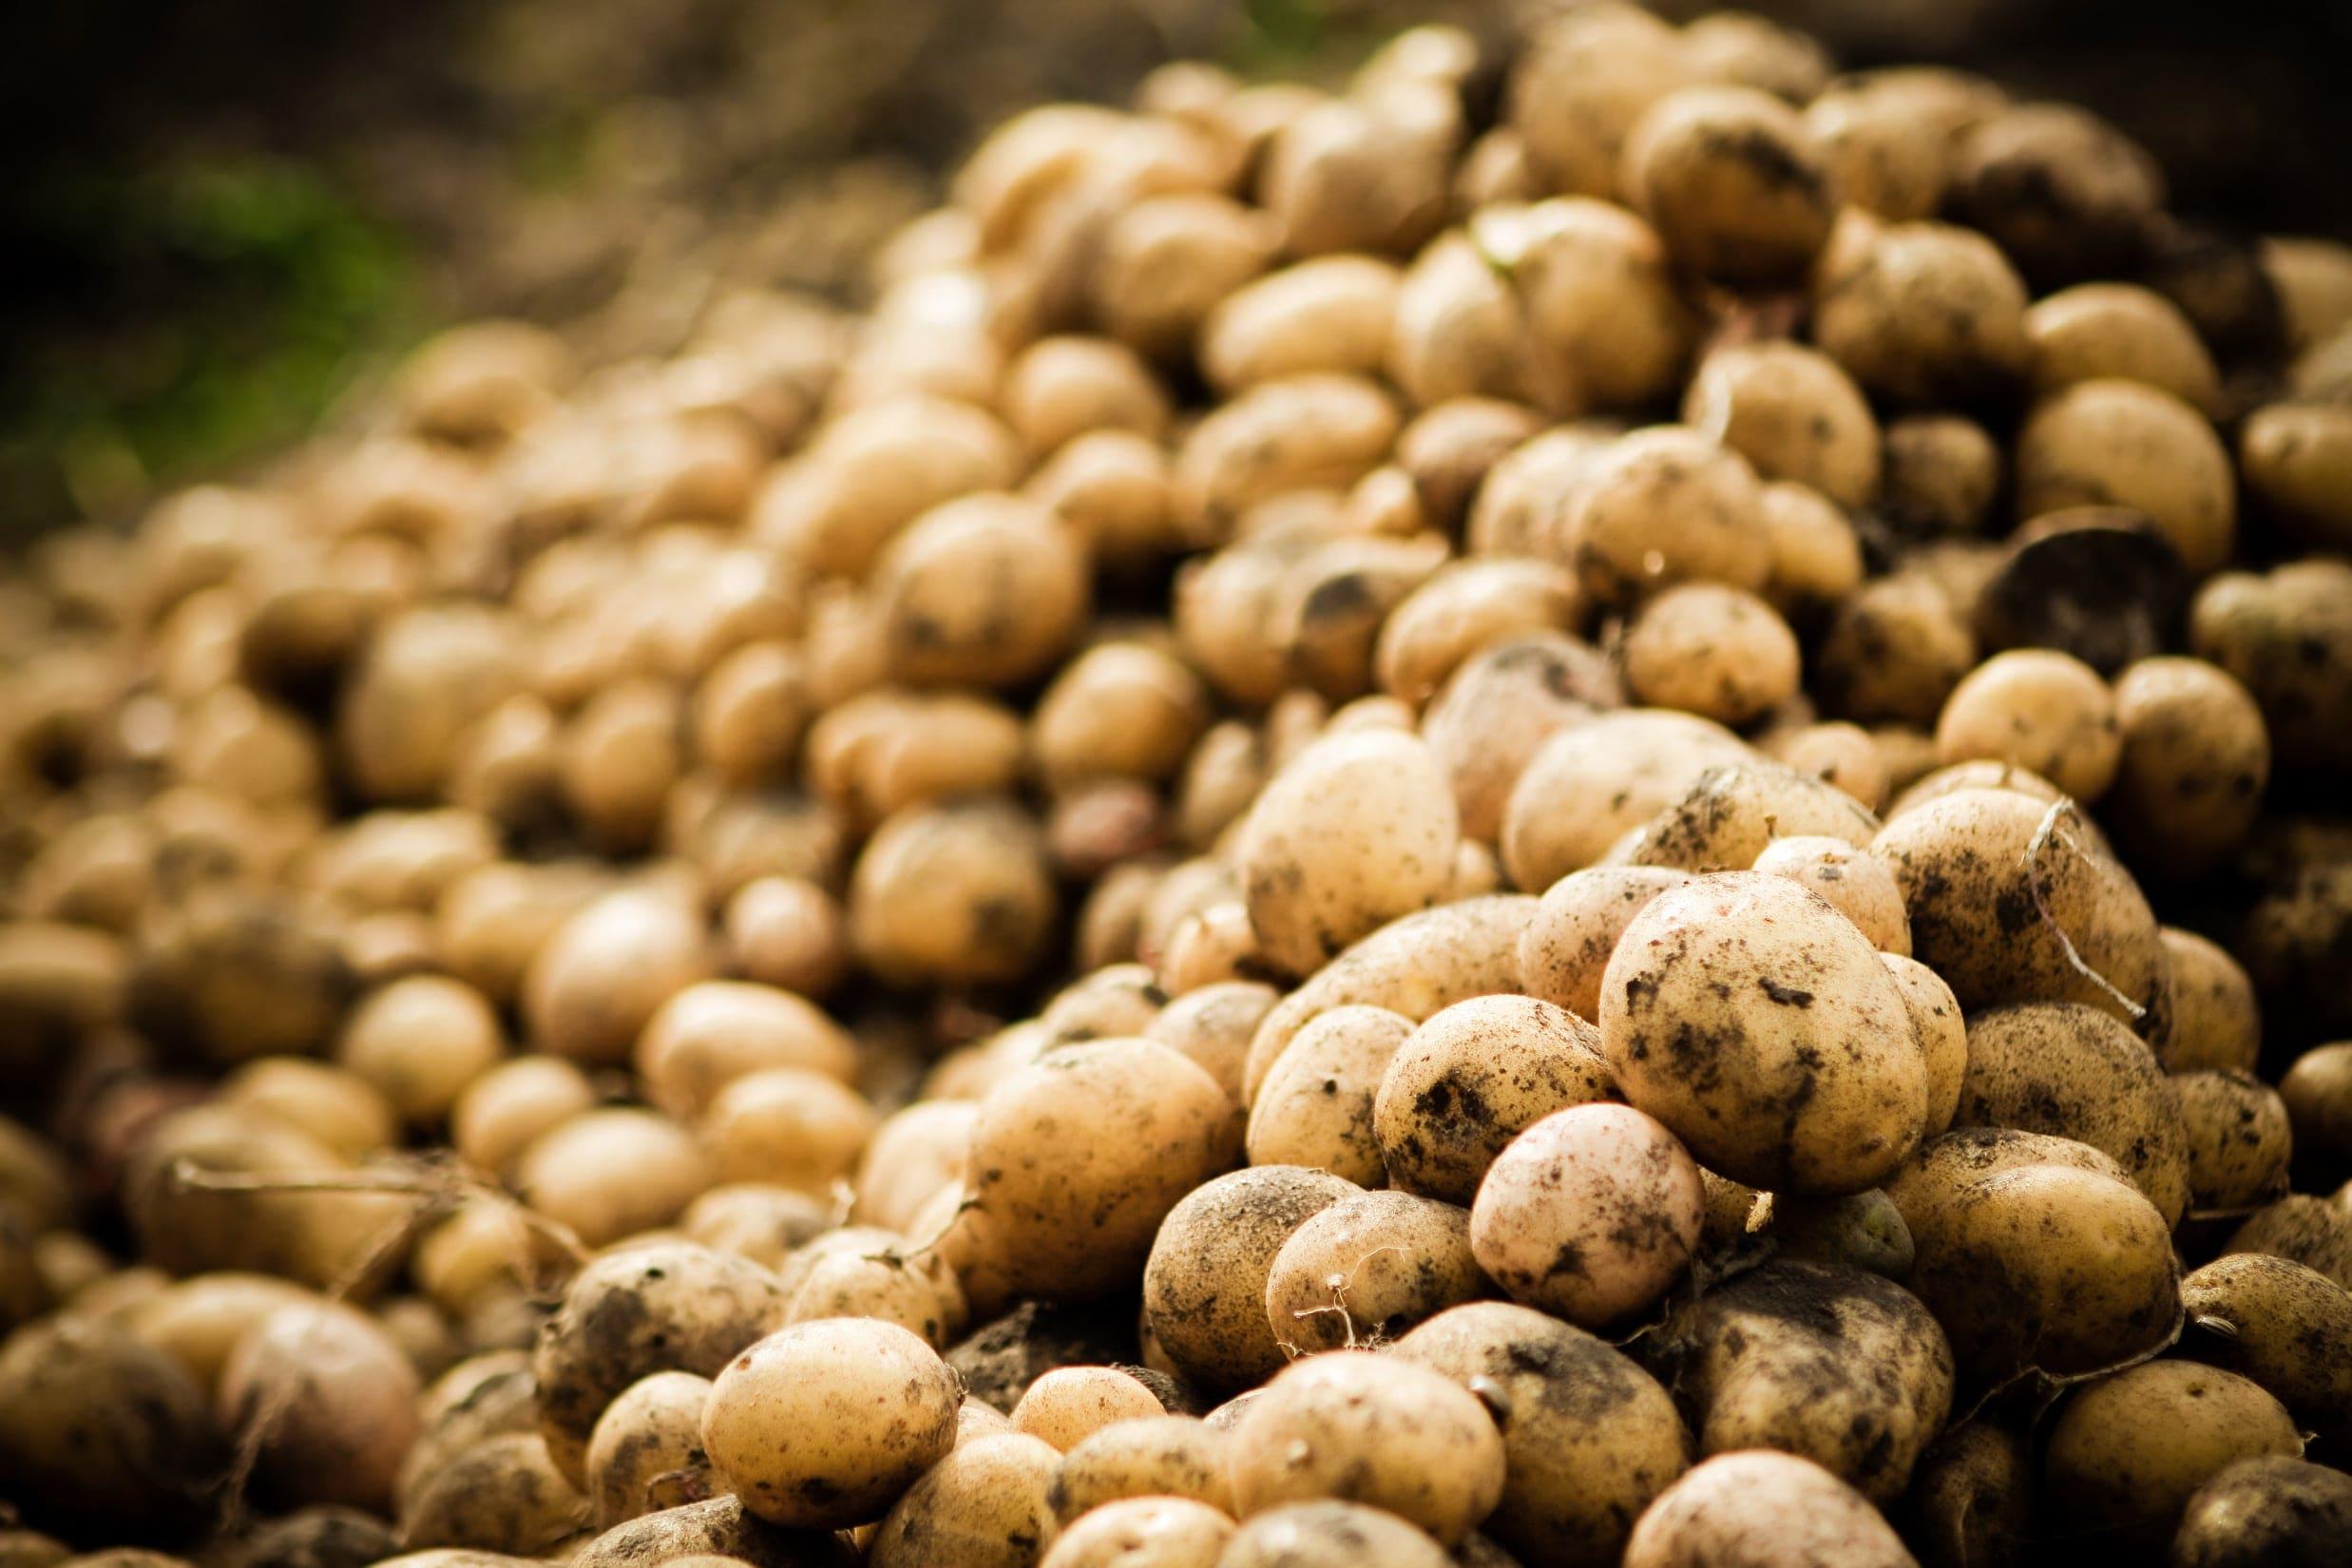 Digging of Potato crop